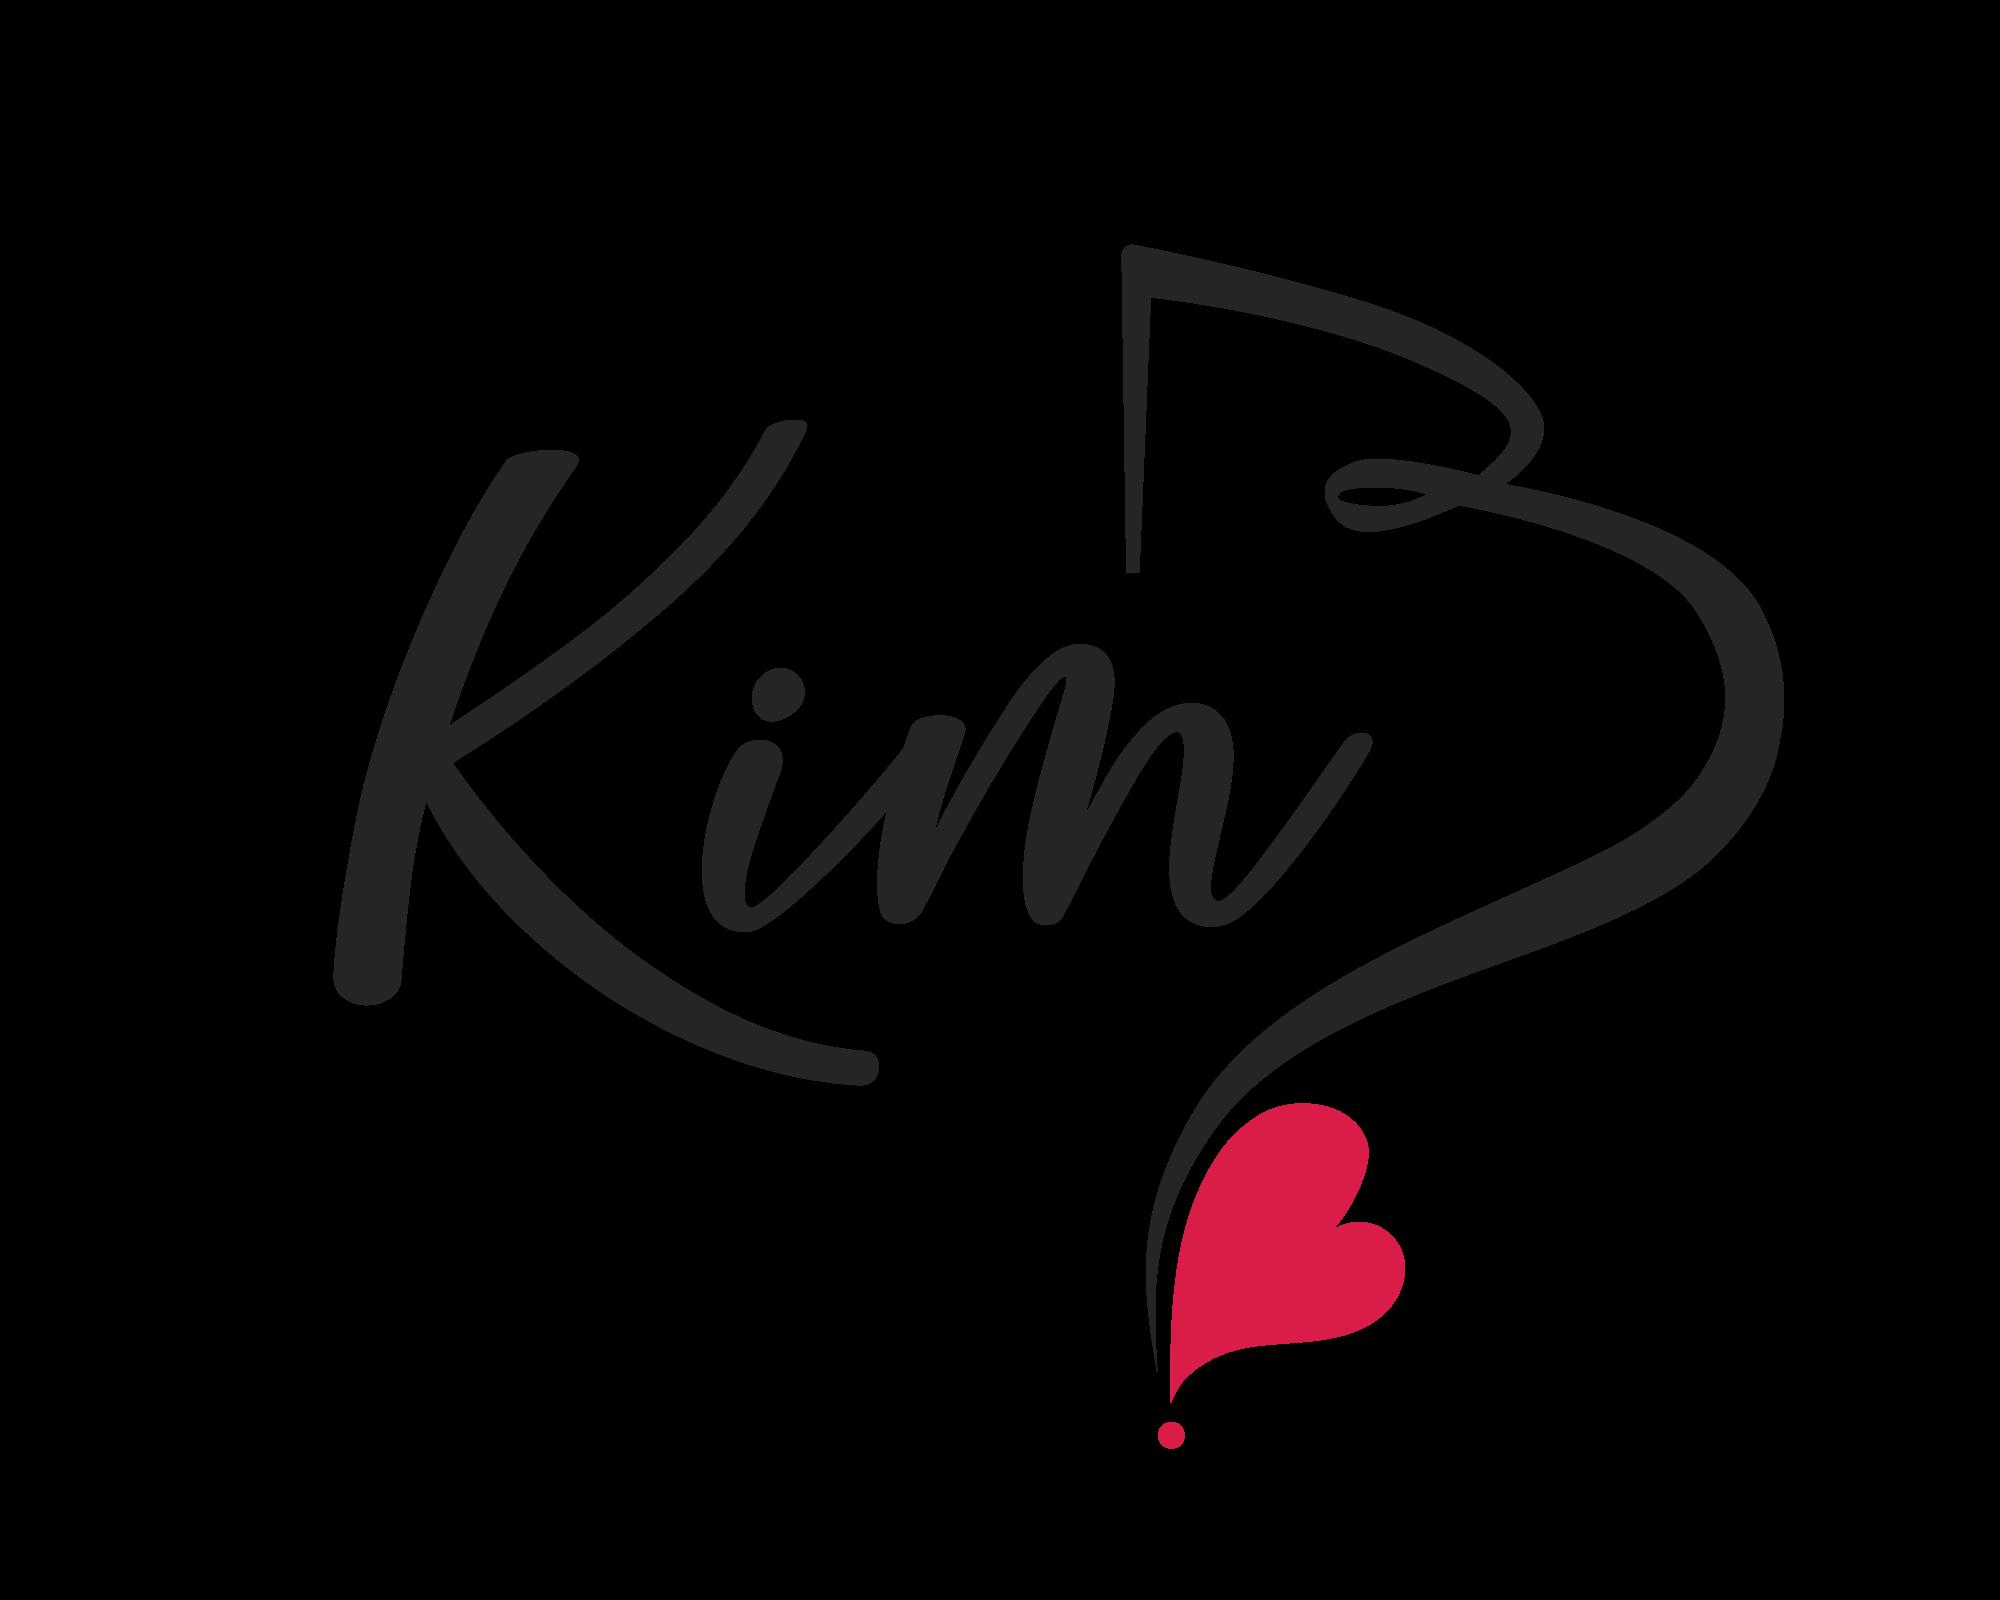 By KimB